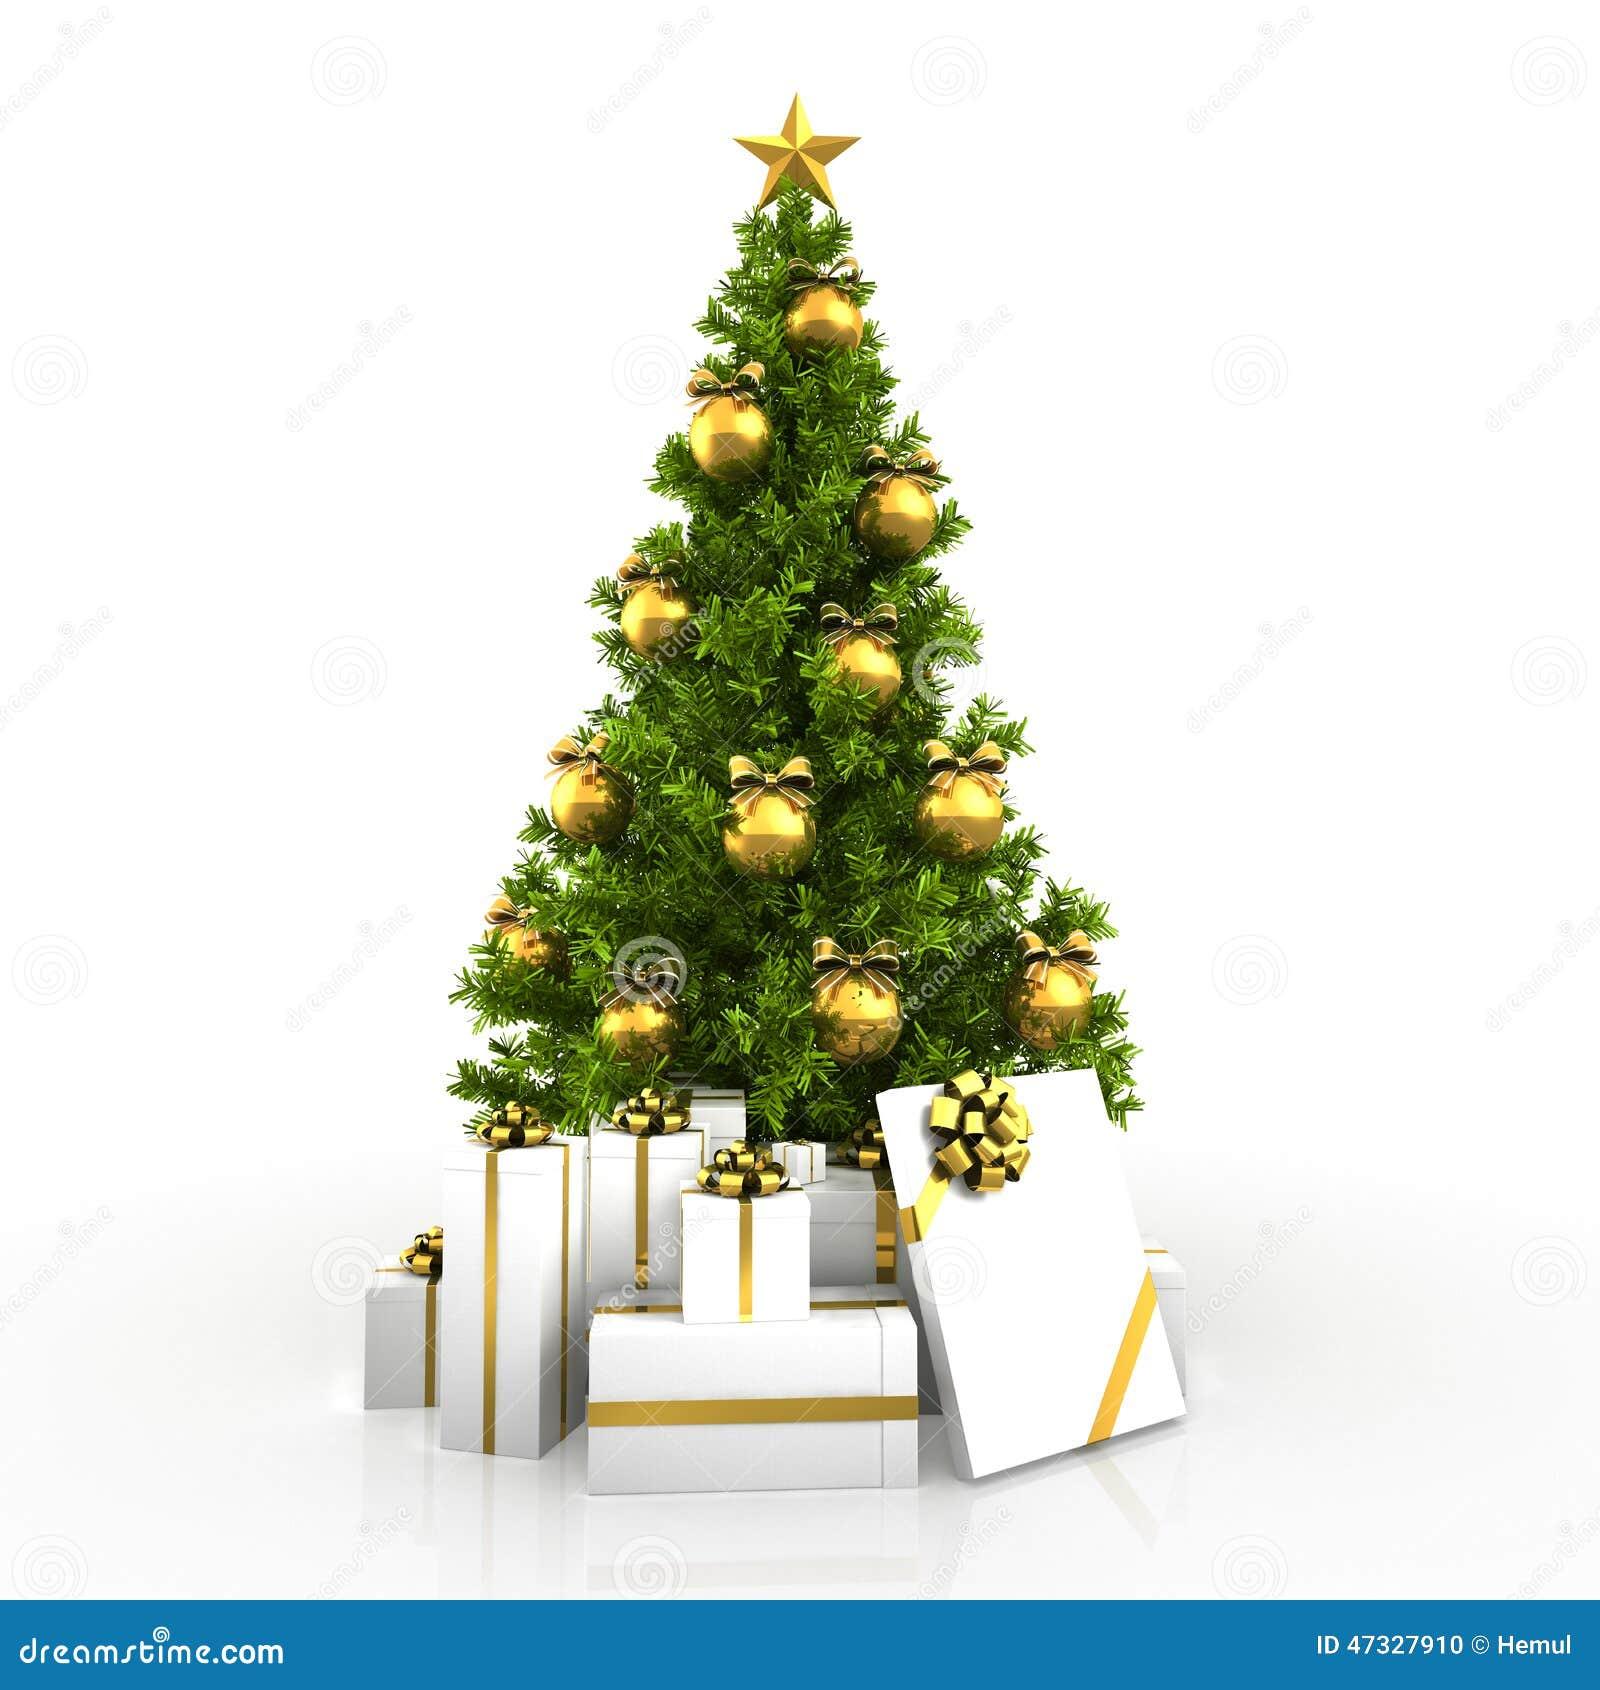 Christmas Tree White Background.Christmas Tree Winh Gold Decor Isolated On White Background